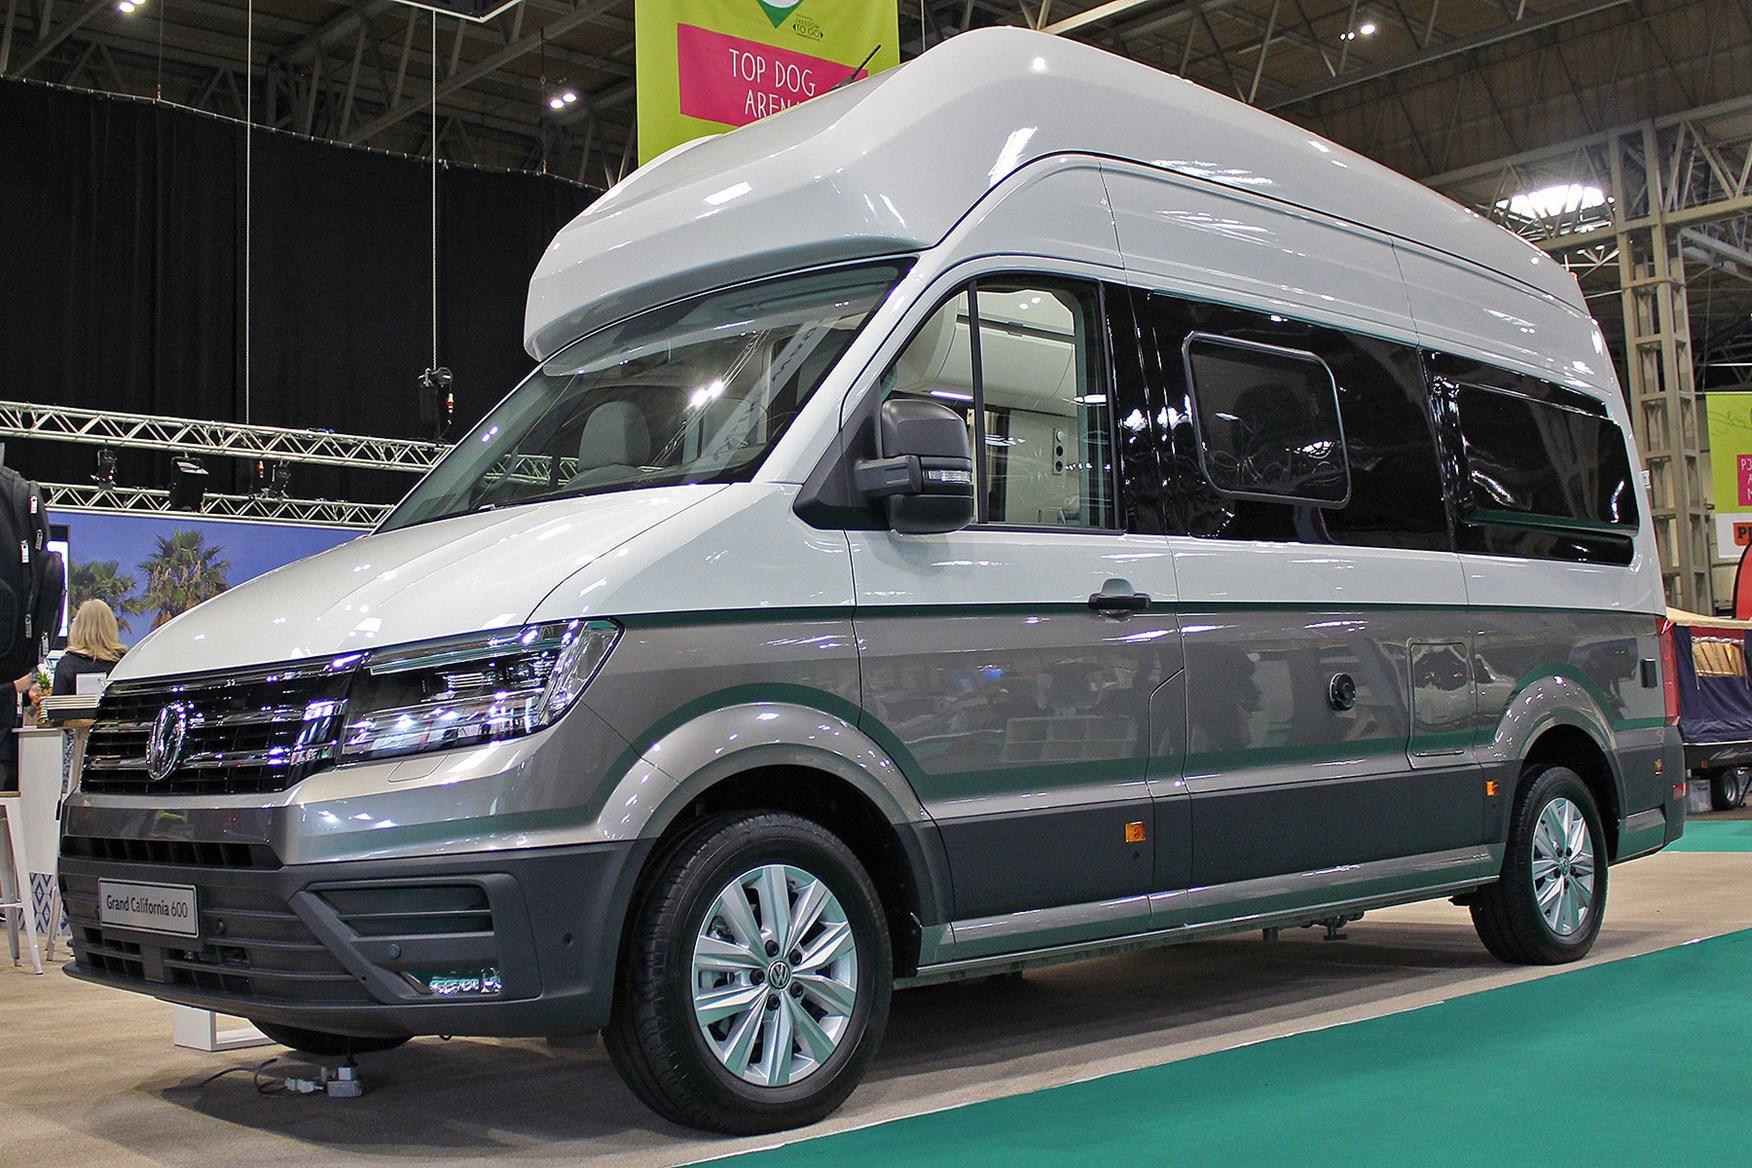 2f6d277243 Volkswagen Grand California campervan makes UK debut - full details ...